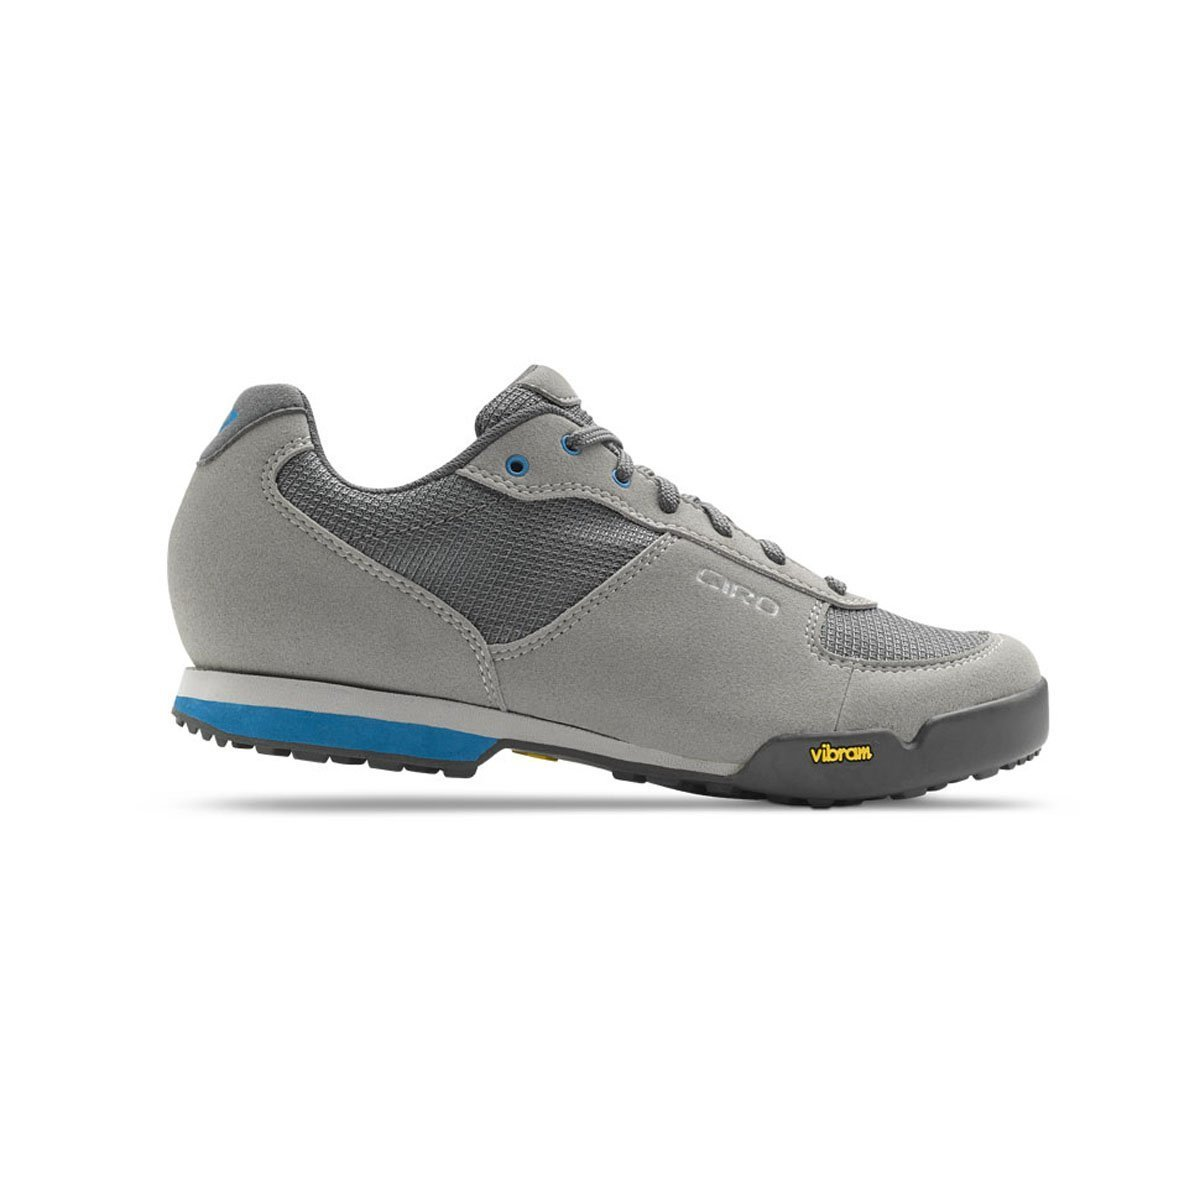 Titanium bluee Jewel Giro Petra VR shoes